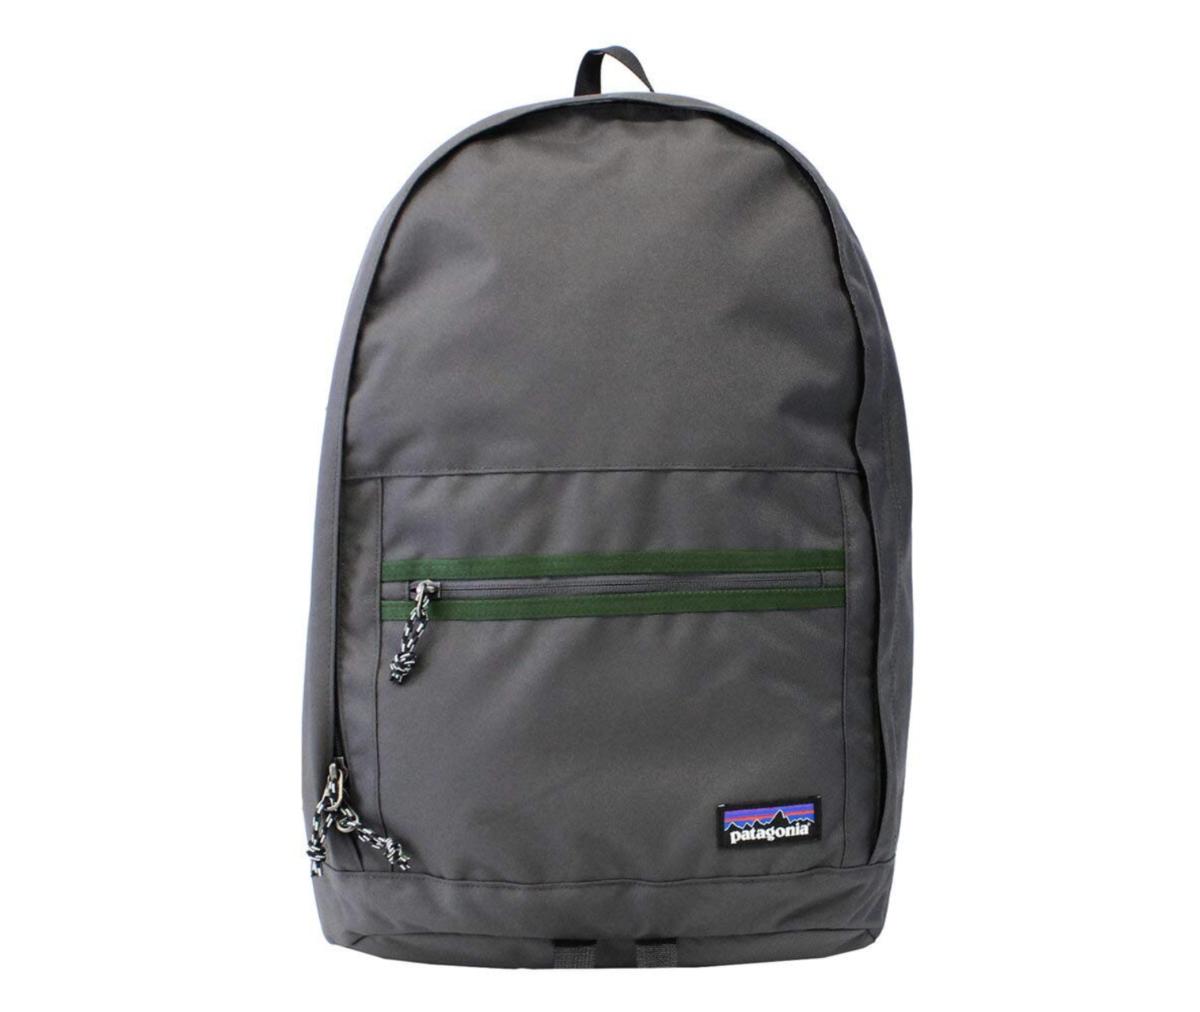 f:id:thebackpack:20190717200024p:plain